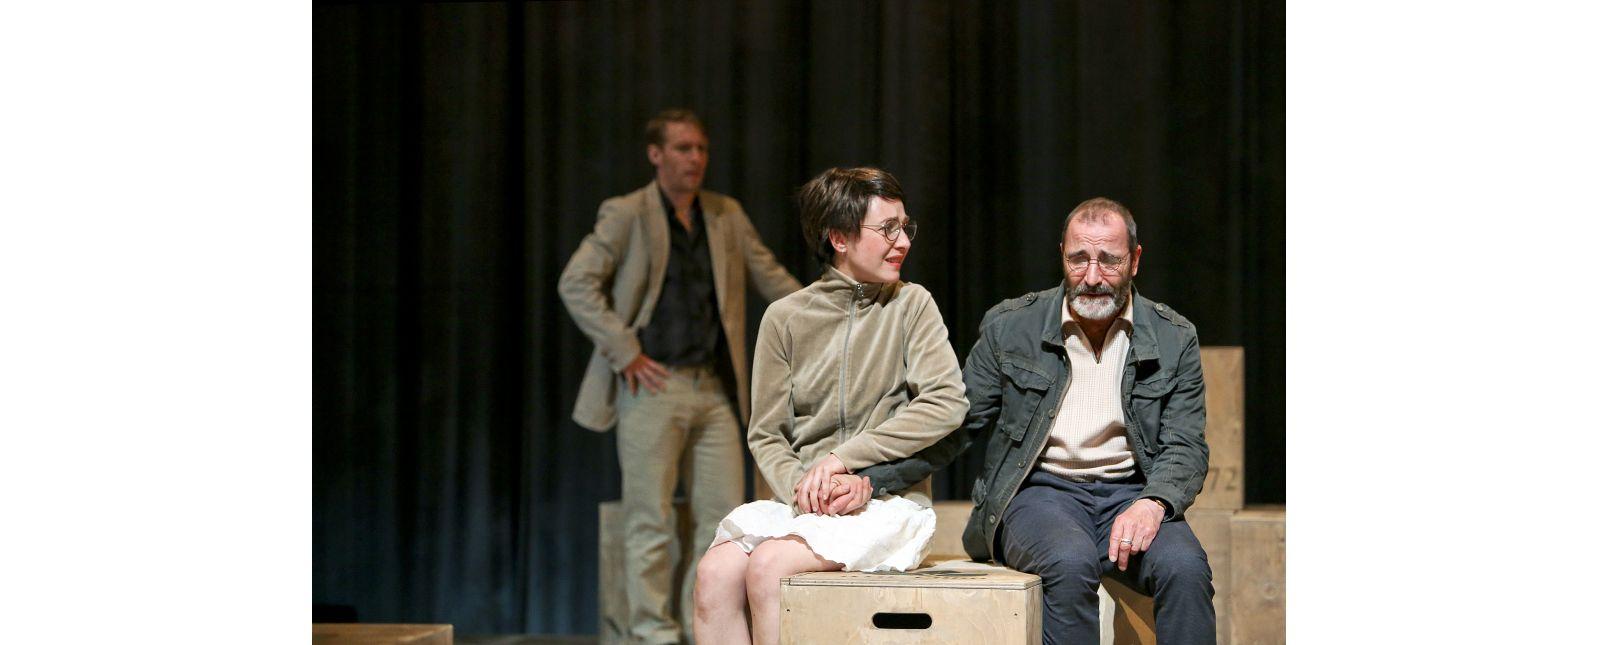 Onkel Wanja // Martin Hohner // Rosa Thormeyer // Henry Meyer //  2019 // Foto: Birgit Hupfeld